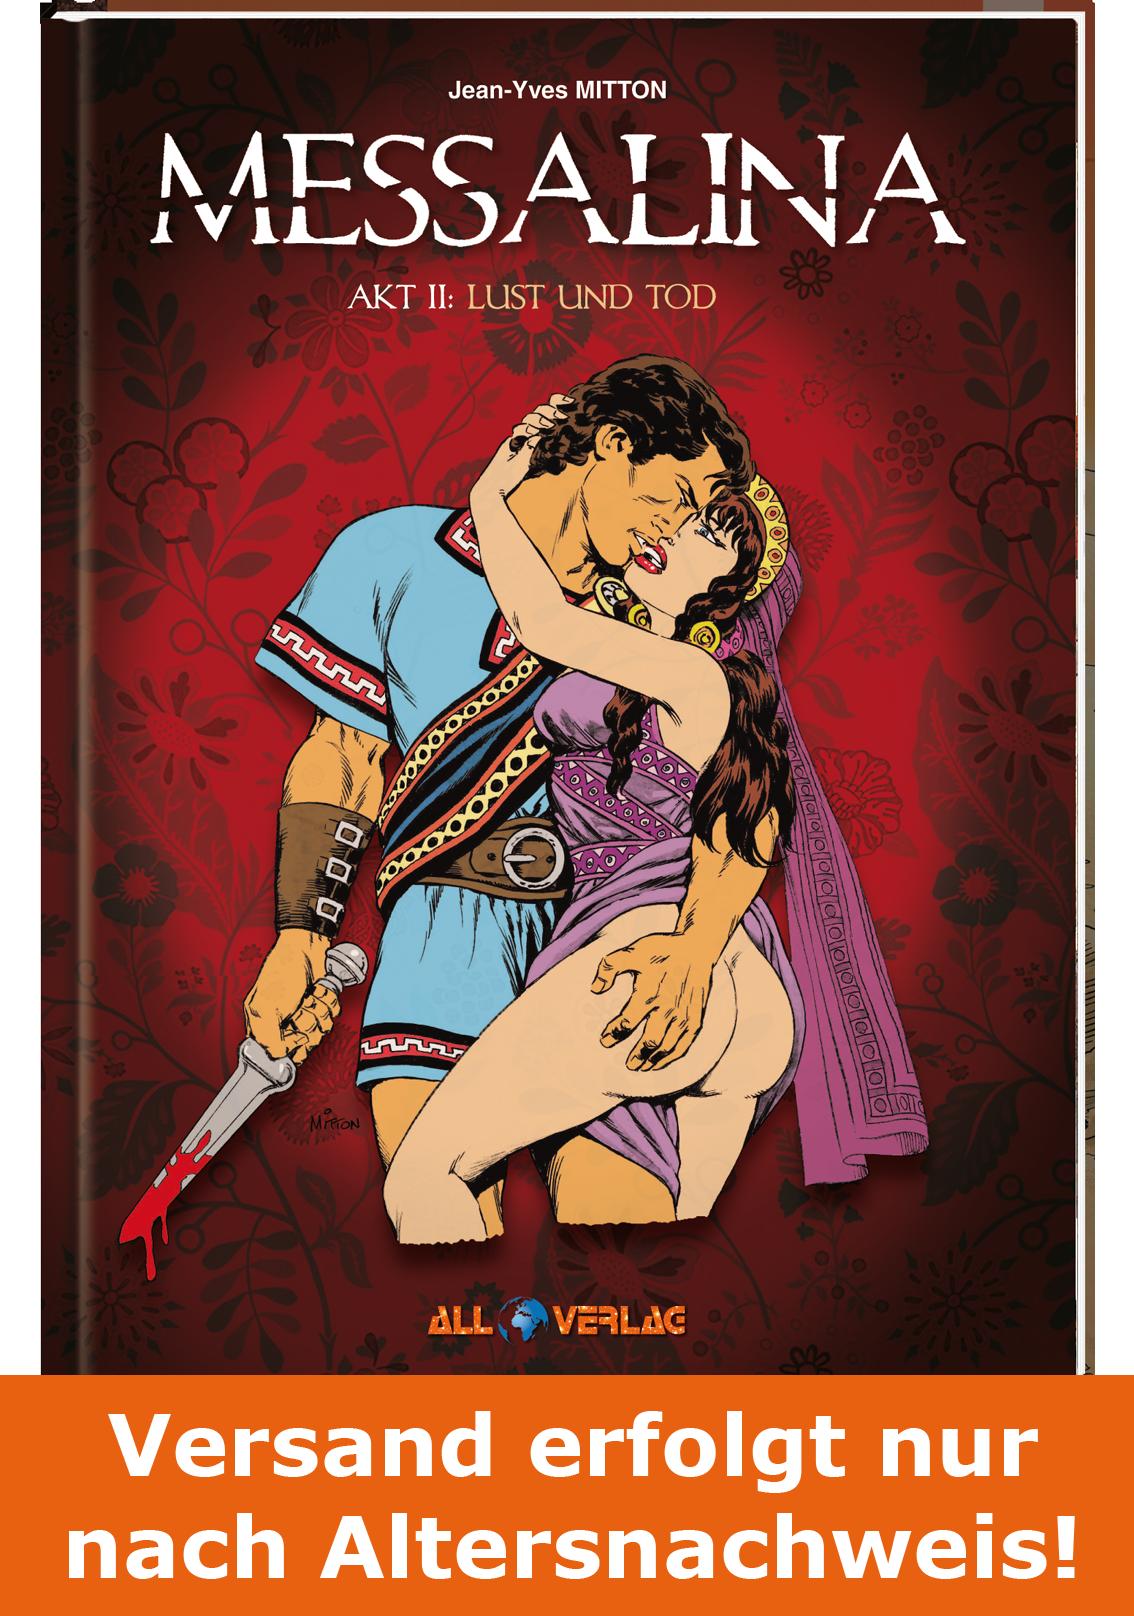 Bildergeschichten sex Erotische geschichten